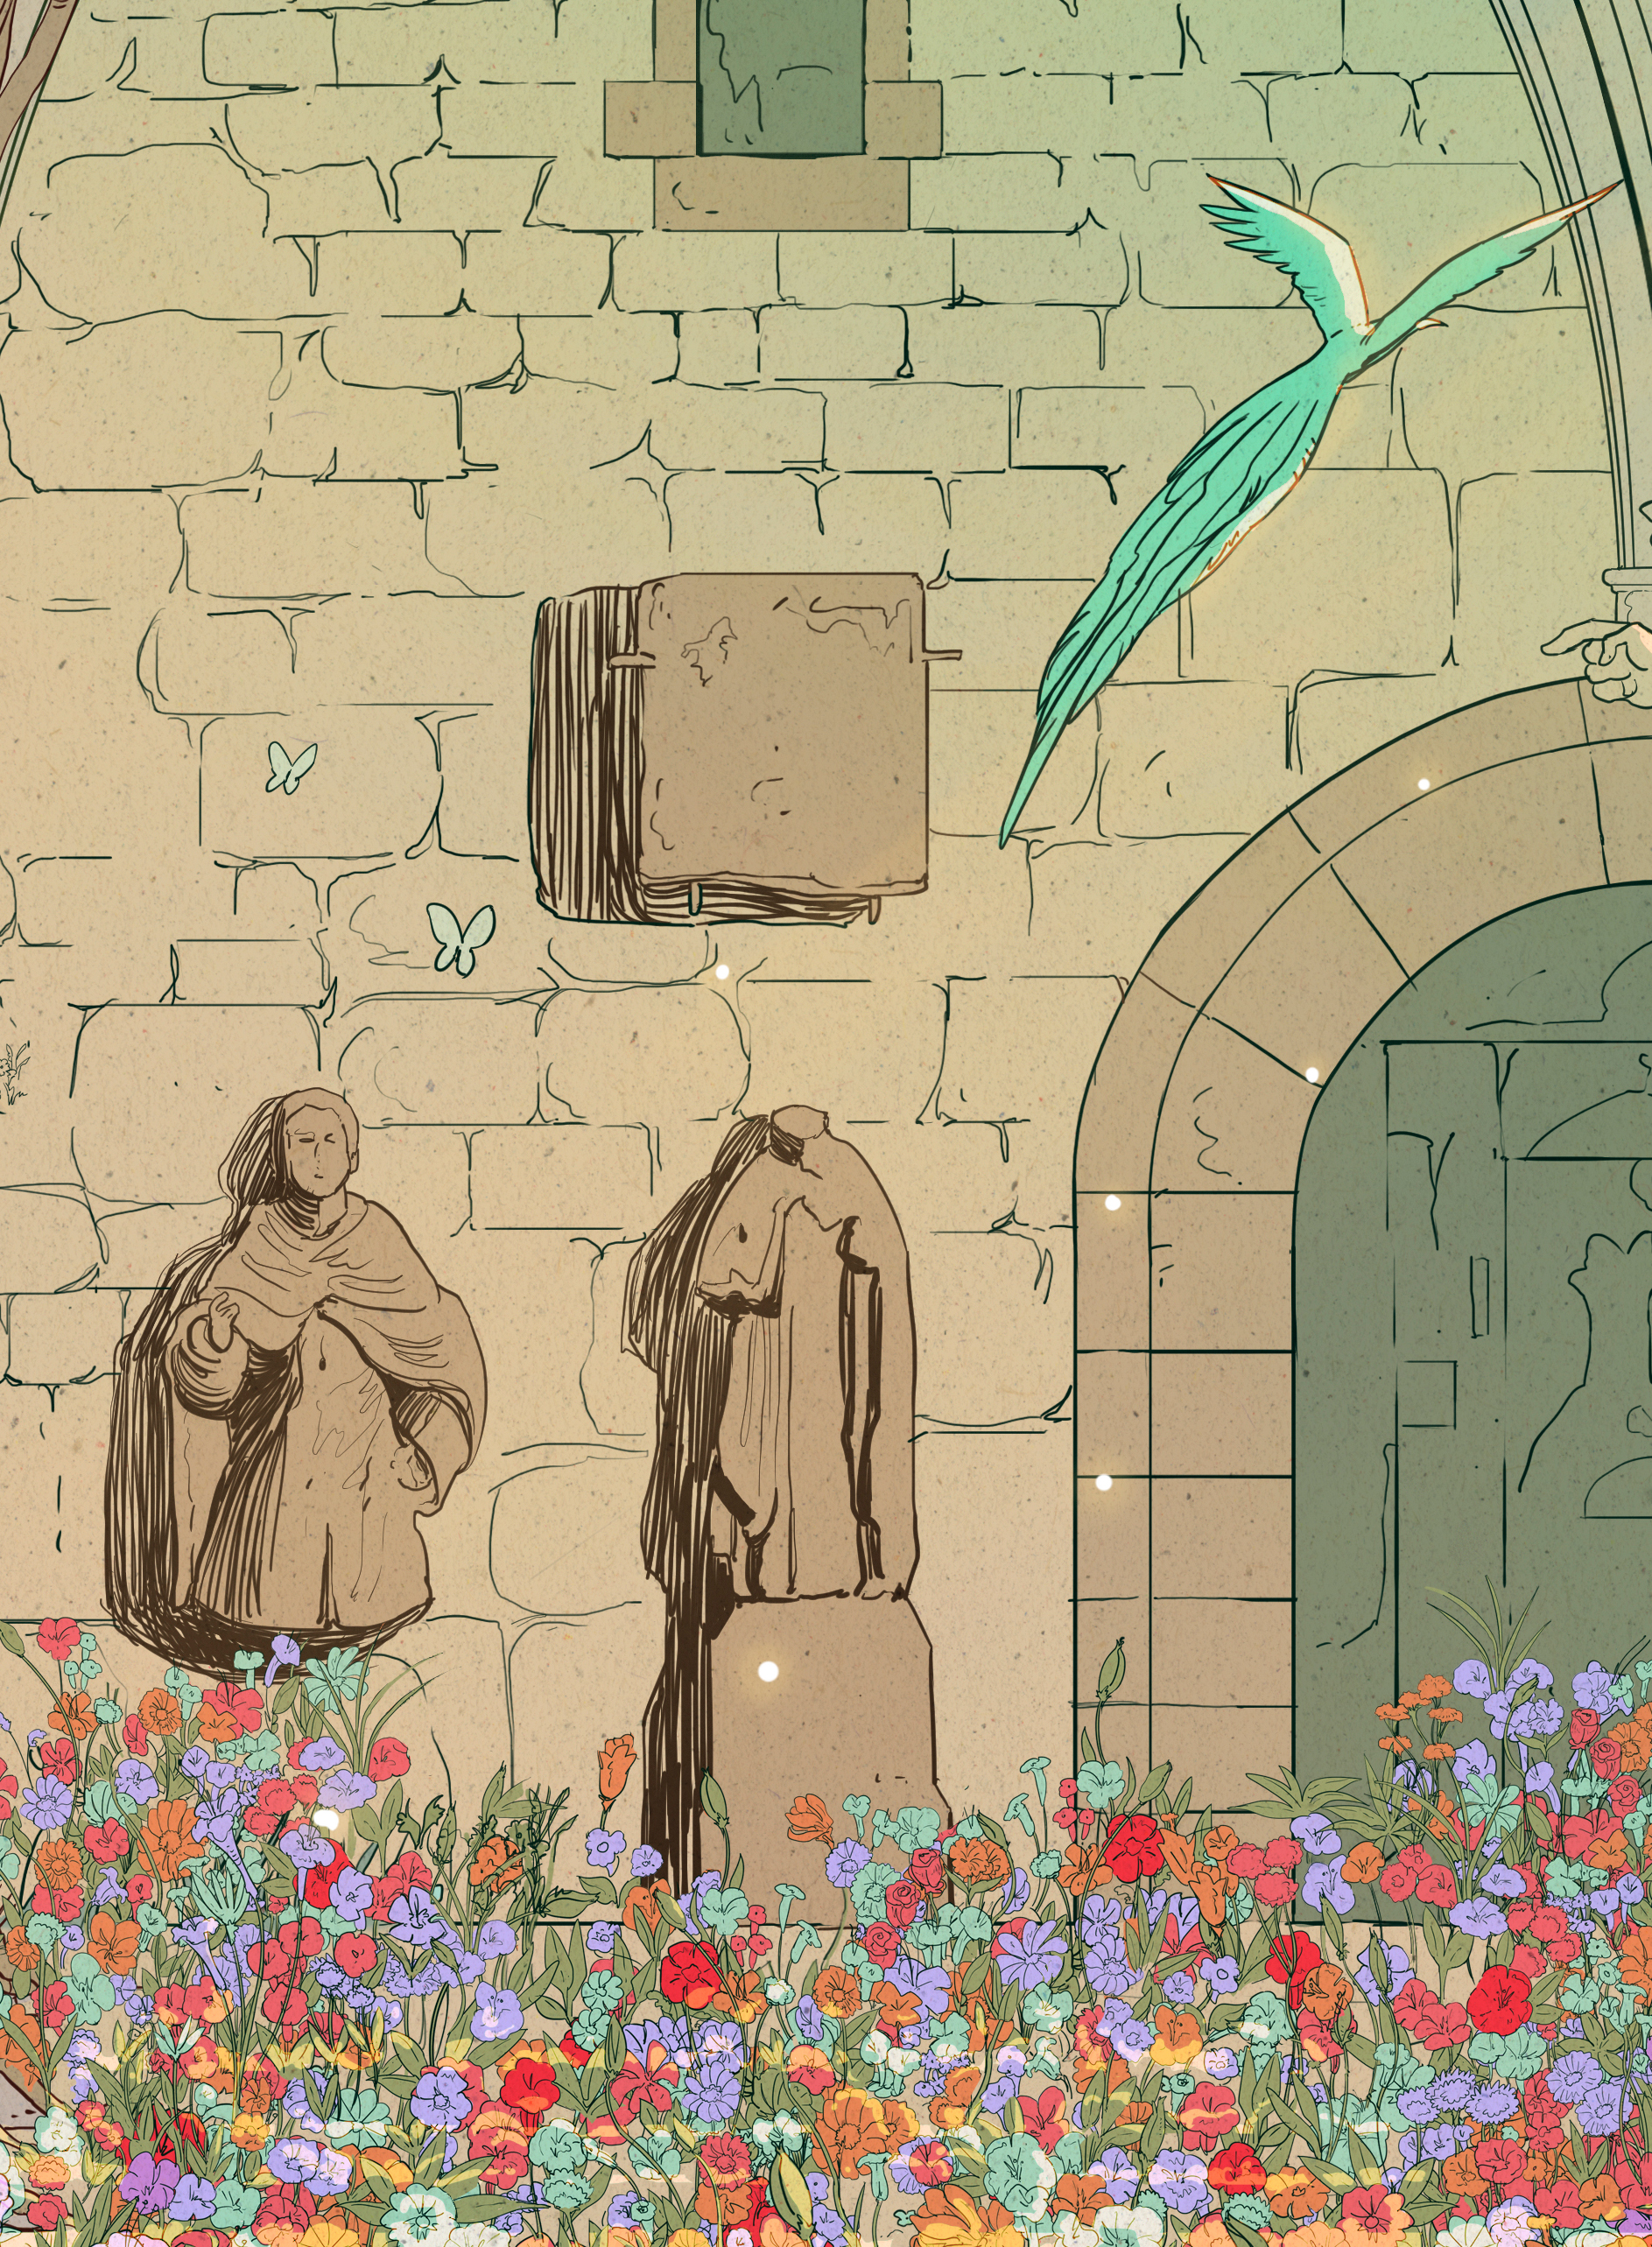 paradores color primavera nicolas castell FINAL rgb det3